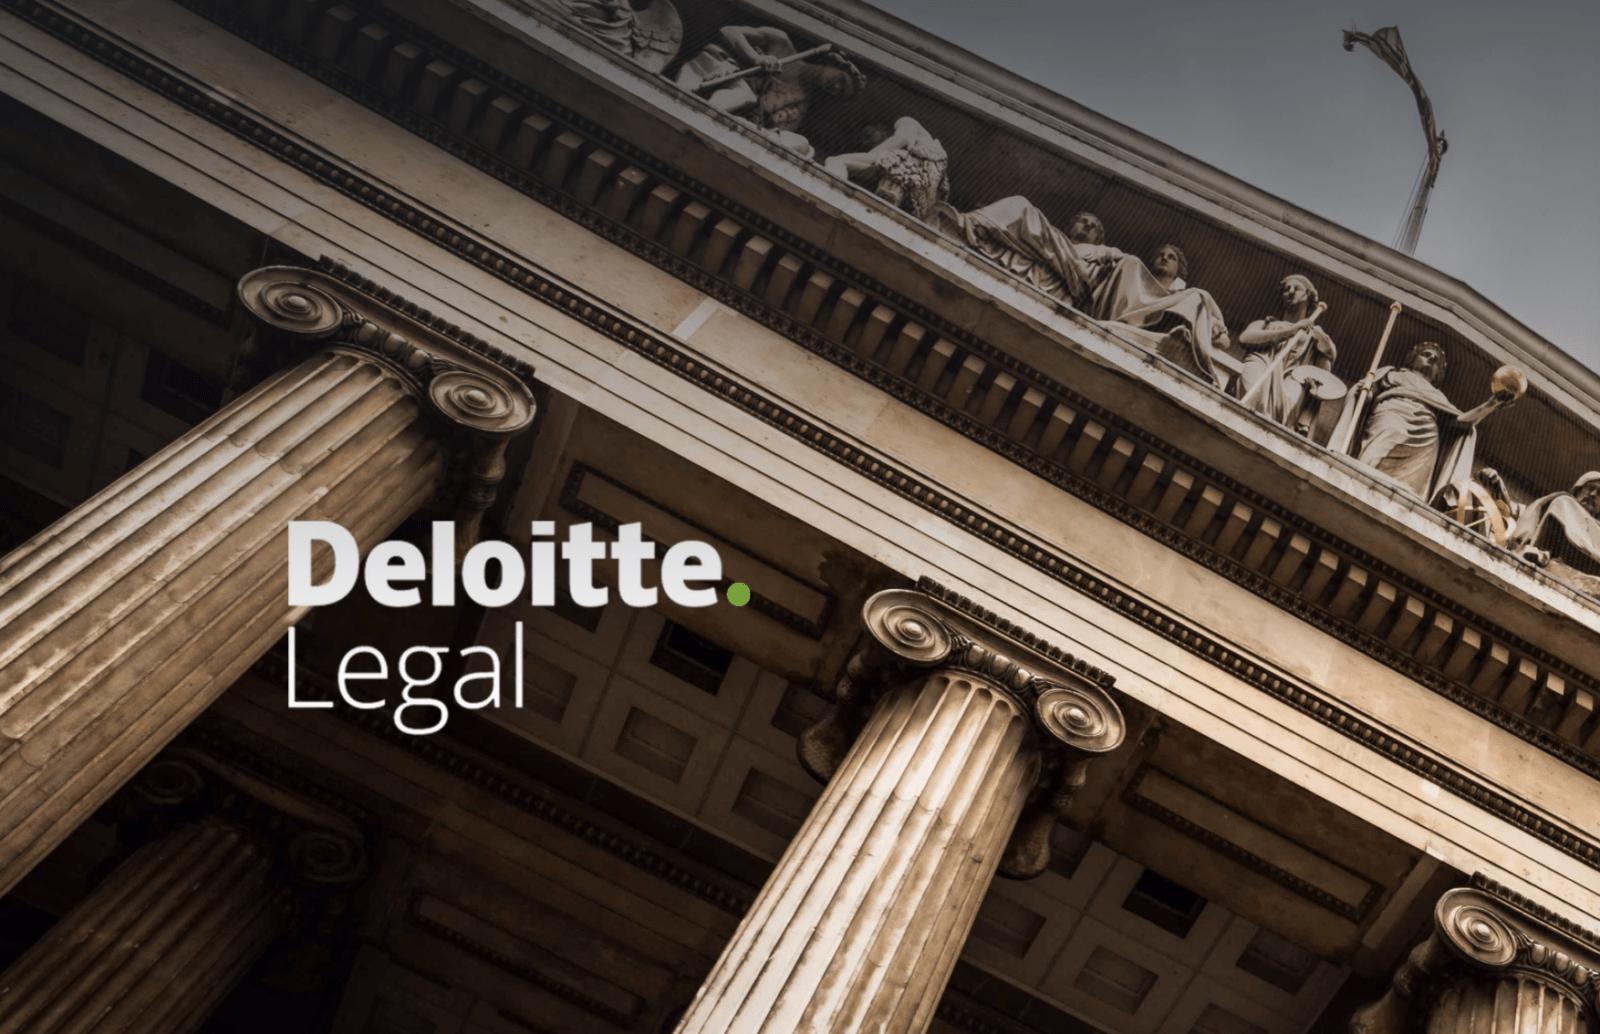 artificiallawyer.com - Deloitte Legal Holds NLP Challenge To 'Understand' Legislation